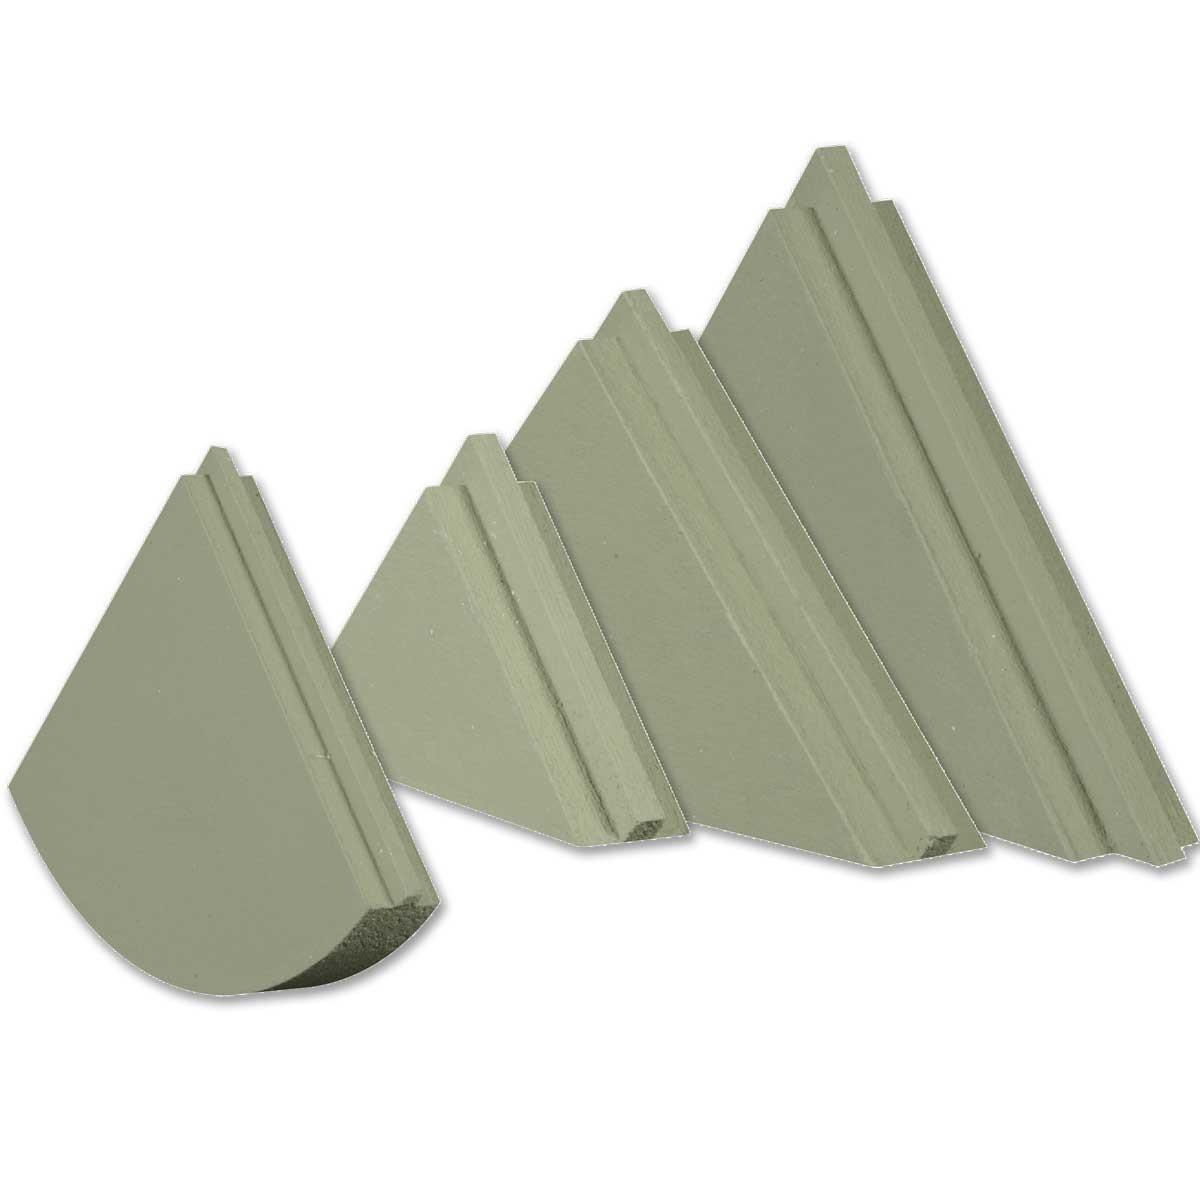 9306-0909-T Laticrete Hydro Ban Preformed Shelves